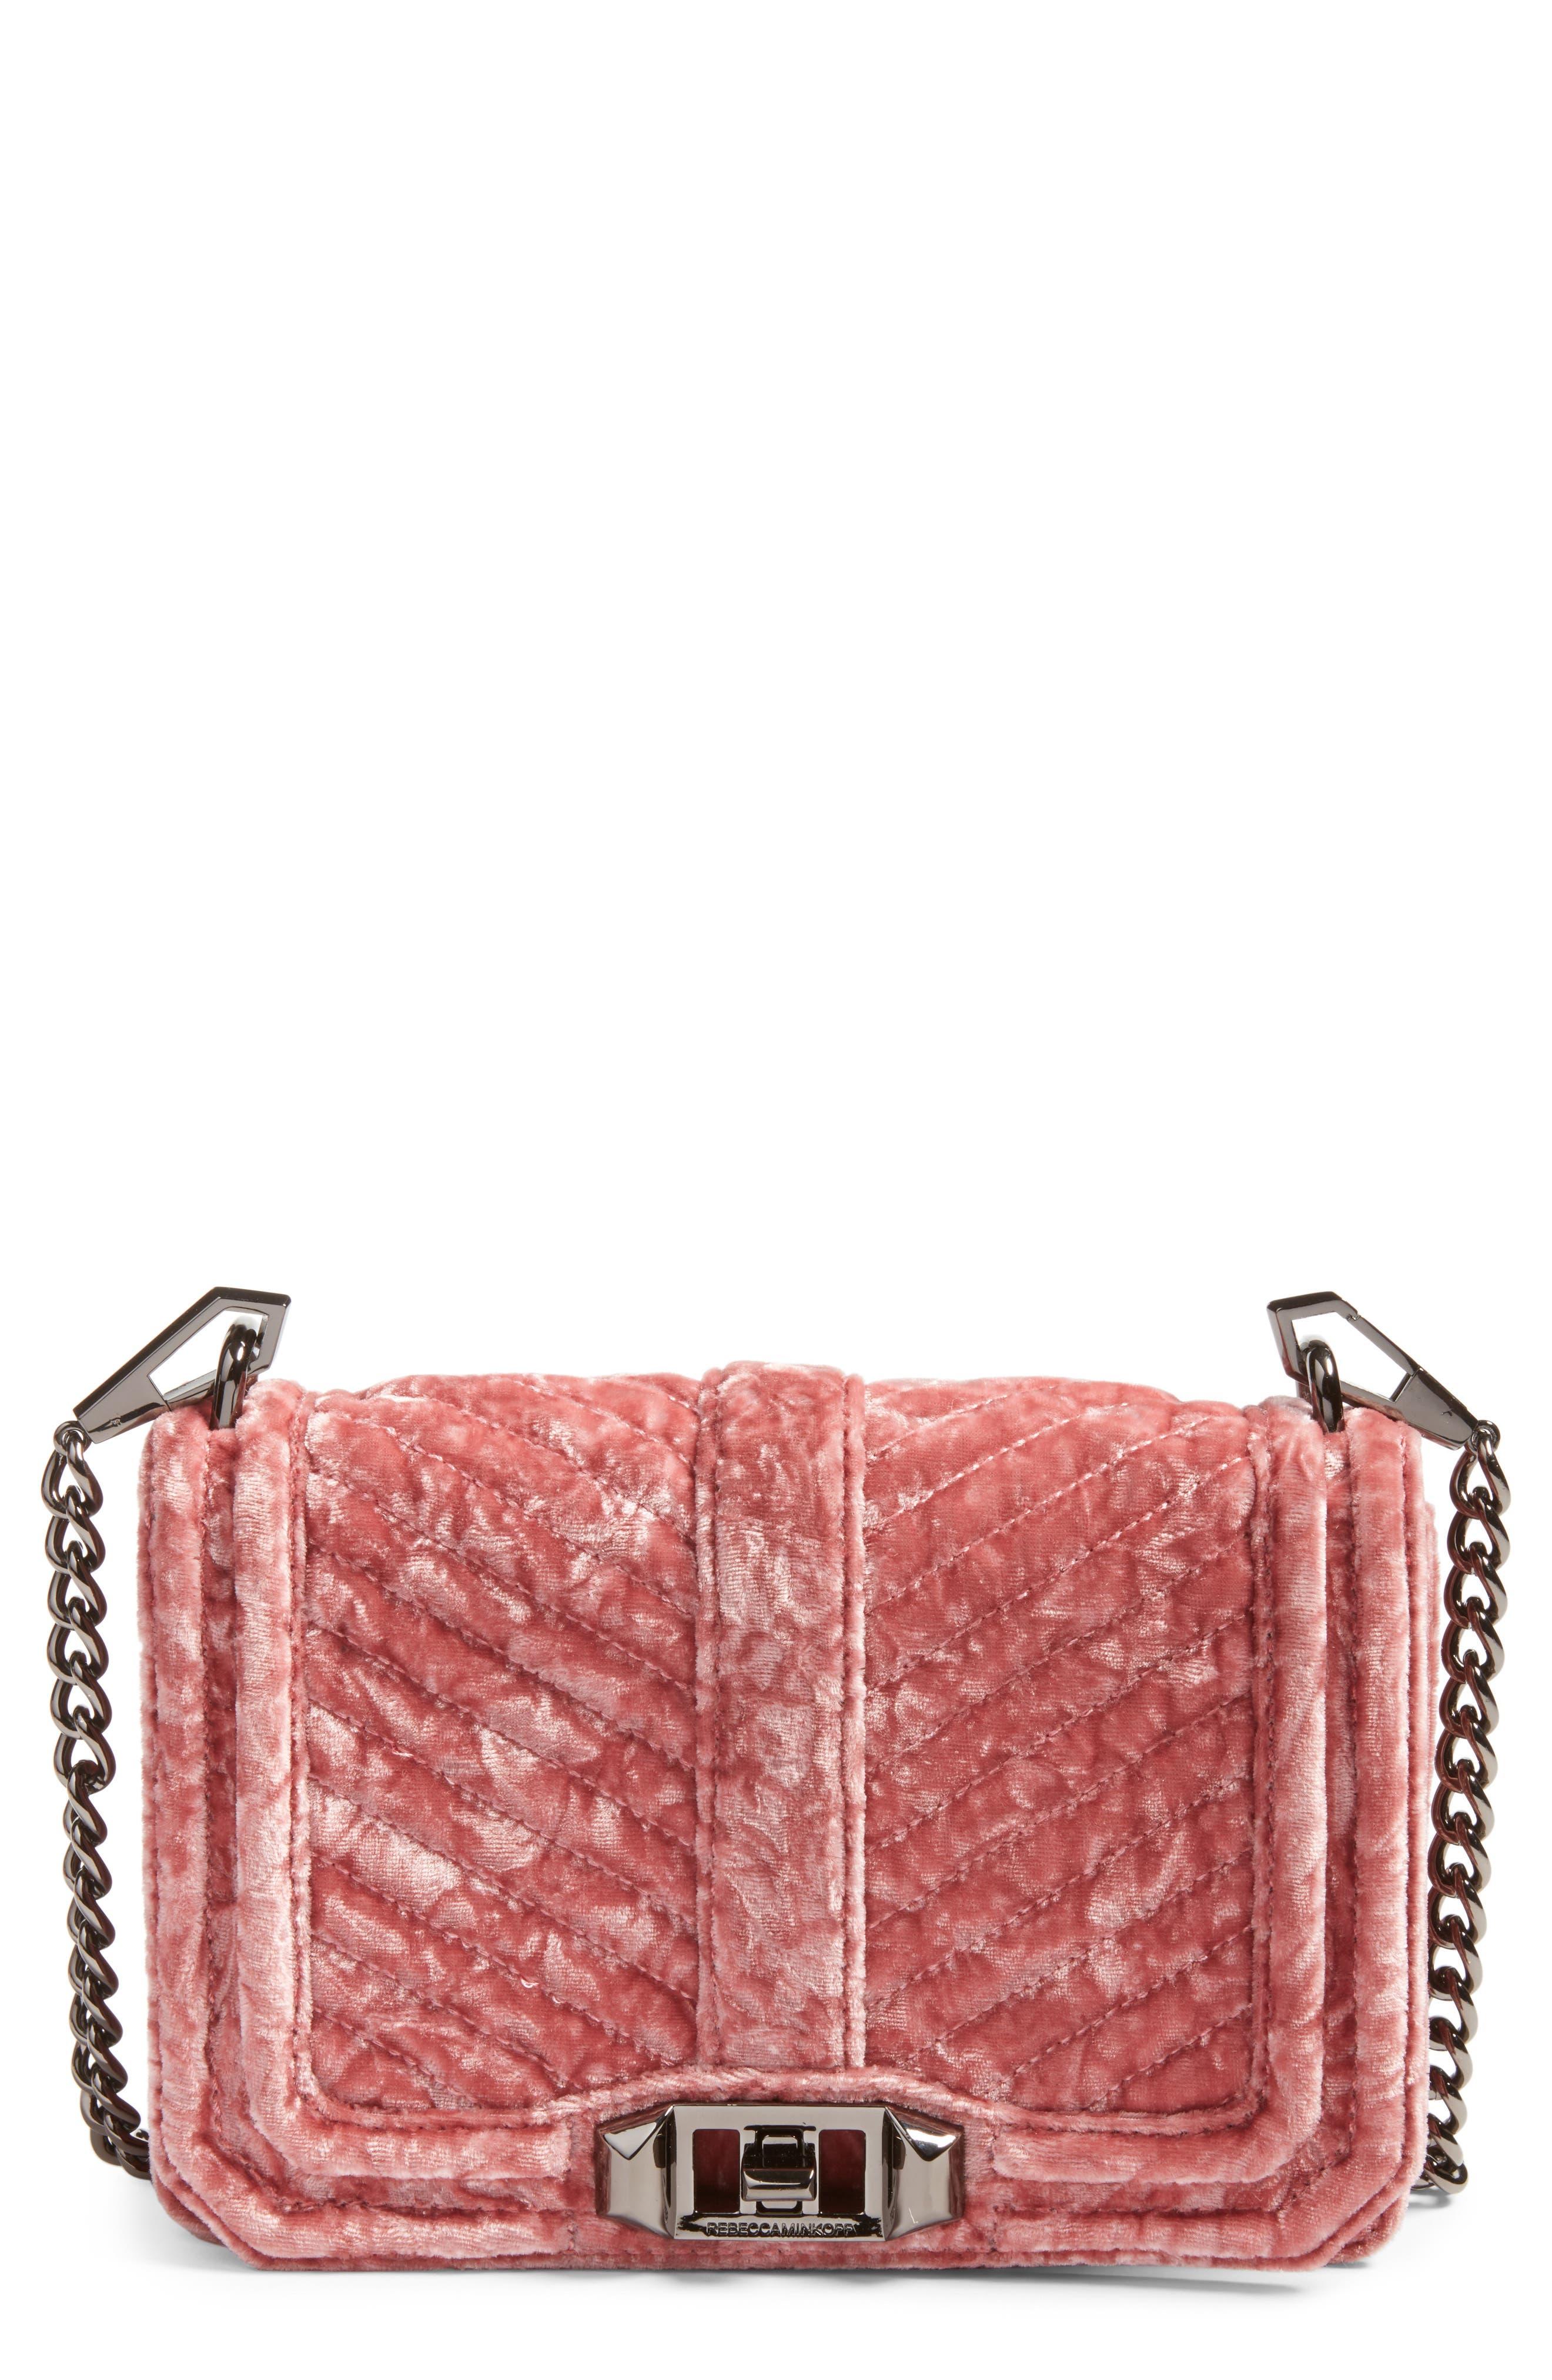 Alternate Image 1 Selected - Rebecca Minkoff Small Love Velvet Crossbody Bag (Nordstrom Exclusive)